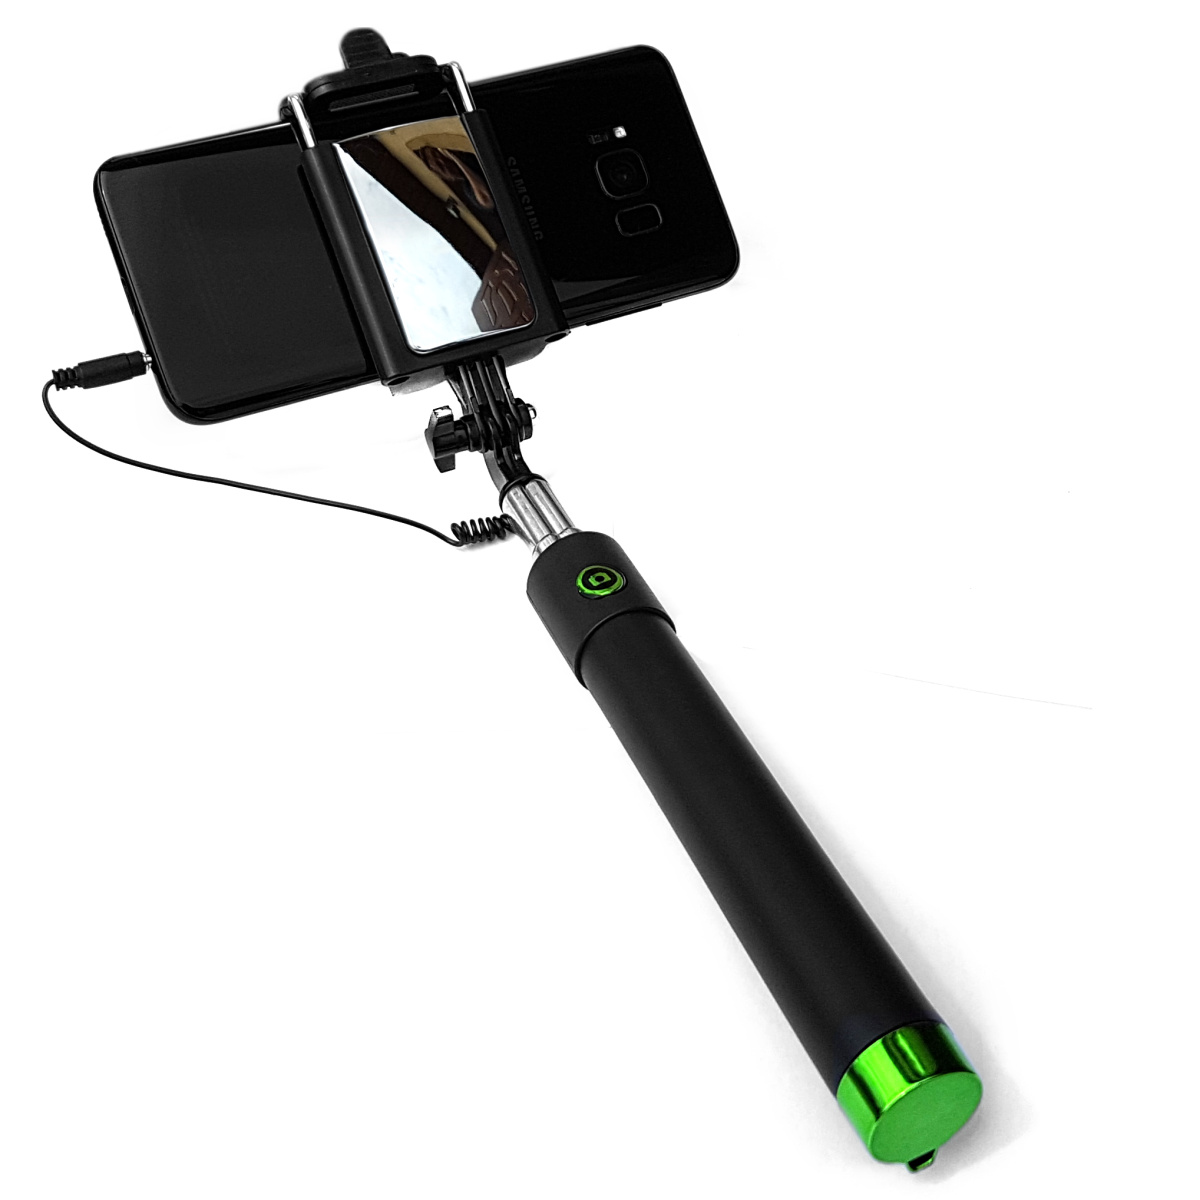 Kijek Selfiestick Monopod Nokia 3 Dual SIM/ 5